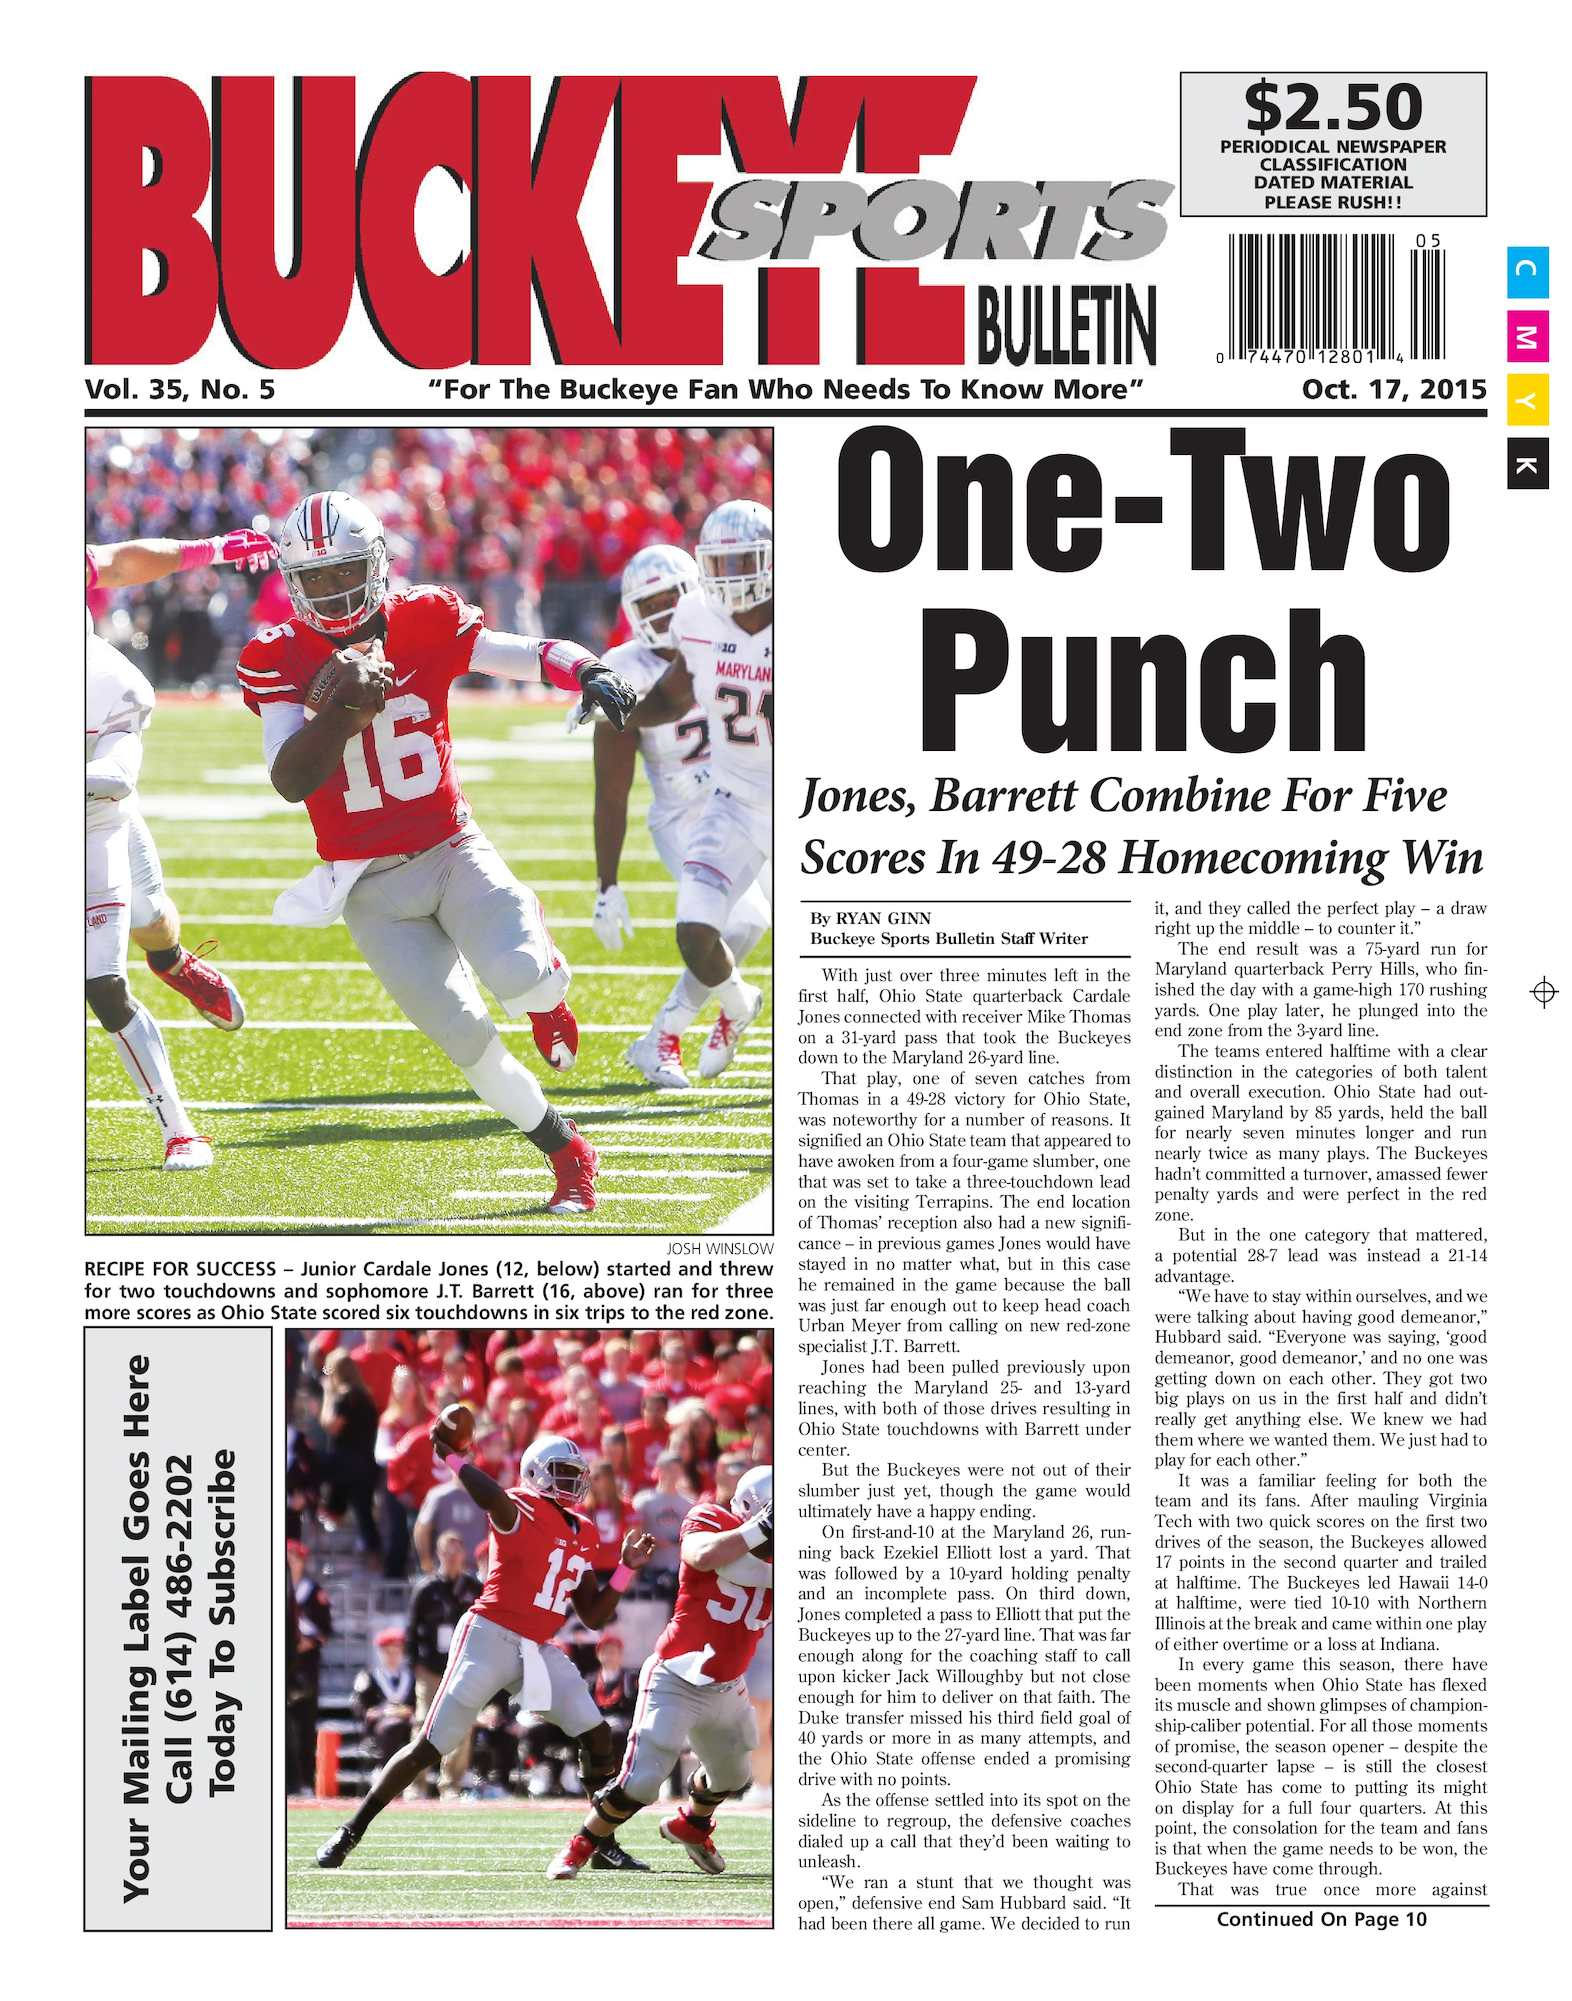 858c3be37d7d Calaméo - Buckeye Sports Bulletin October 17